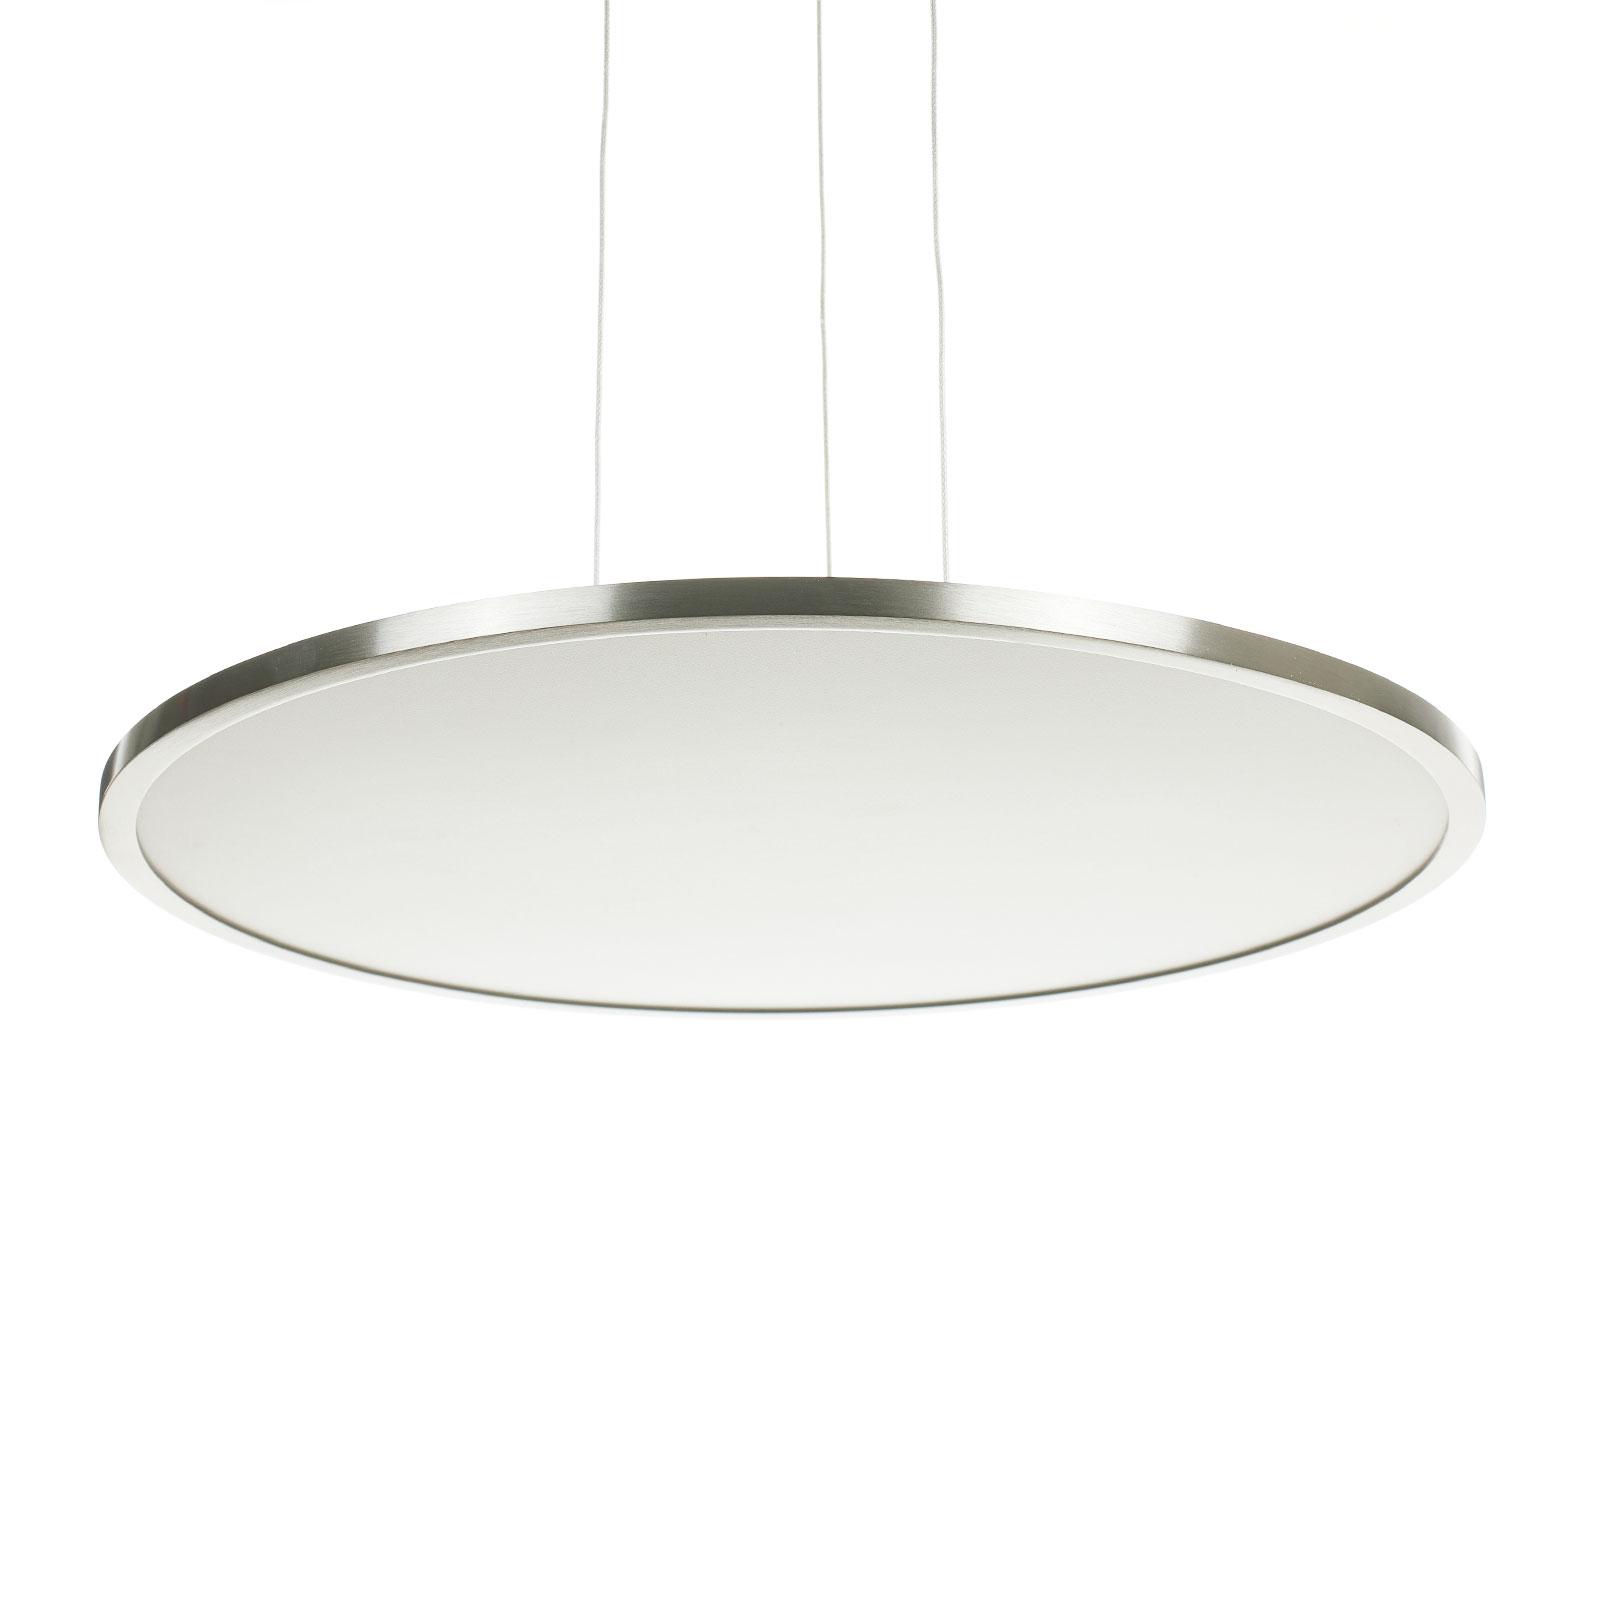 LED-Deckenleuchte Ceres, easydim, nickel, Ø45cm